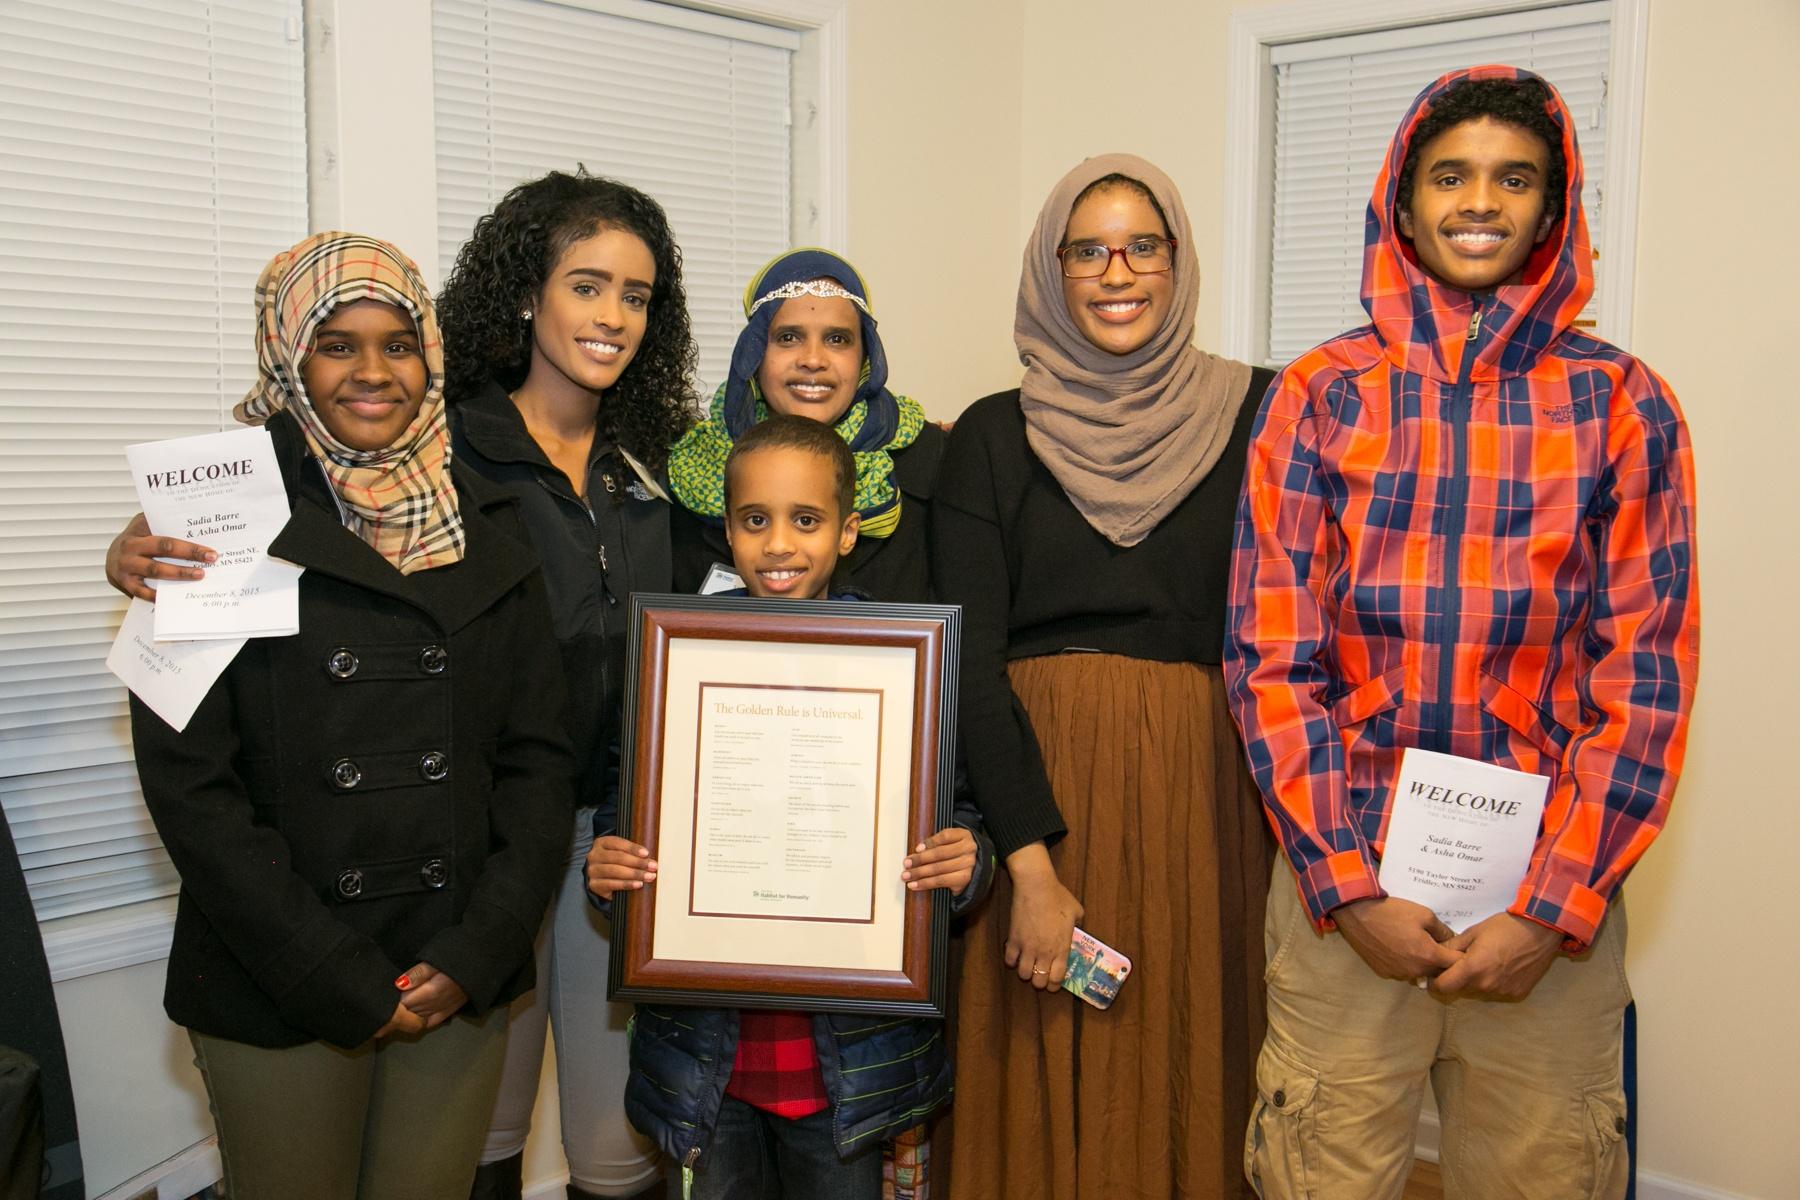 Sadia & Asha's family